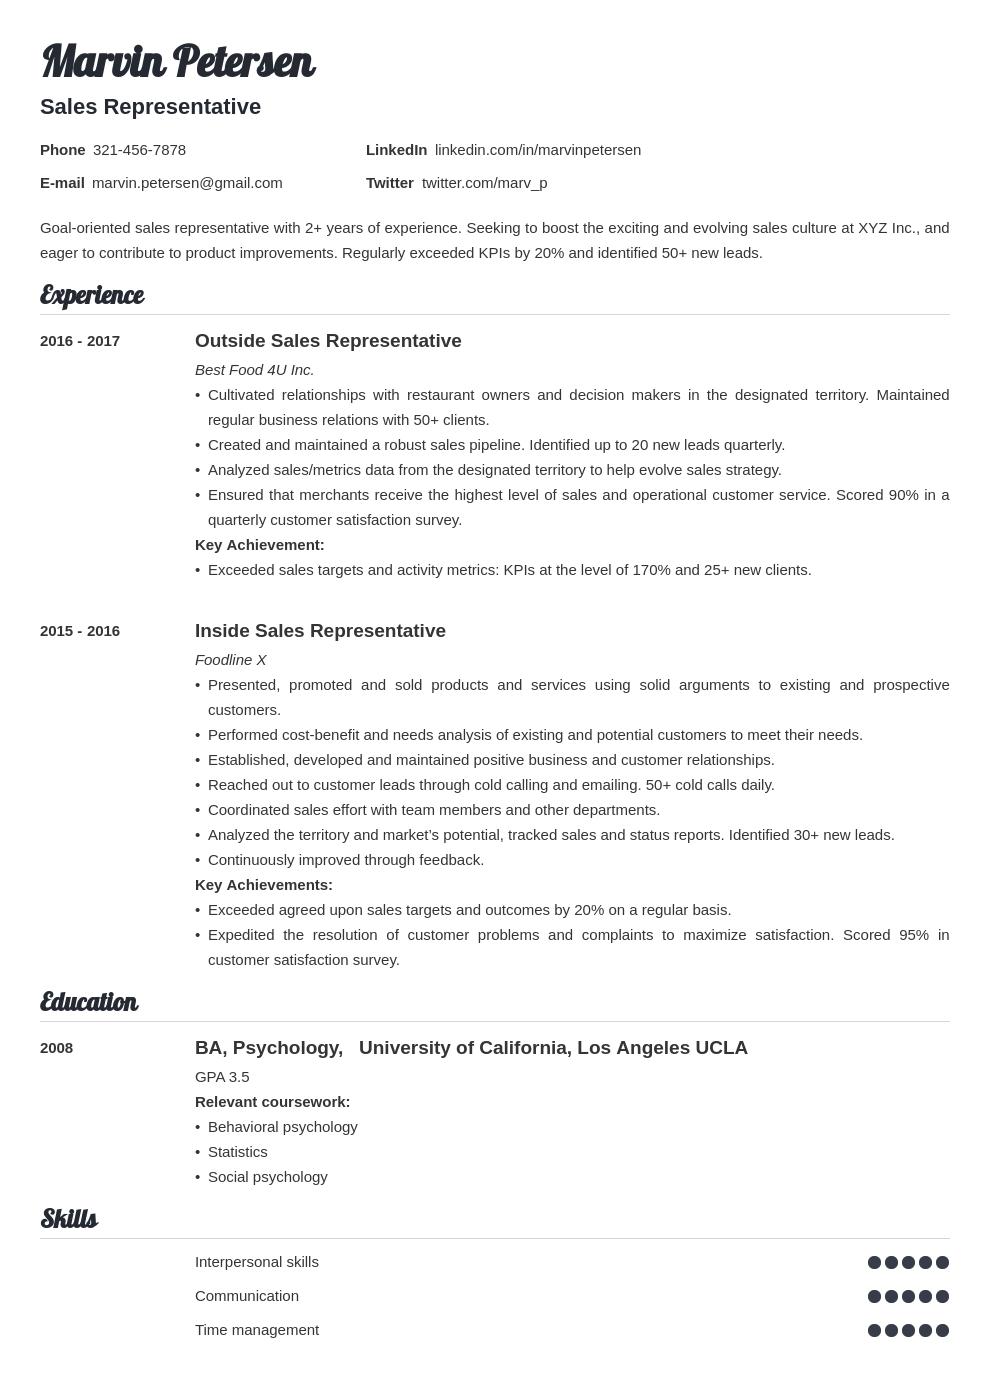 sales representative template valera uk